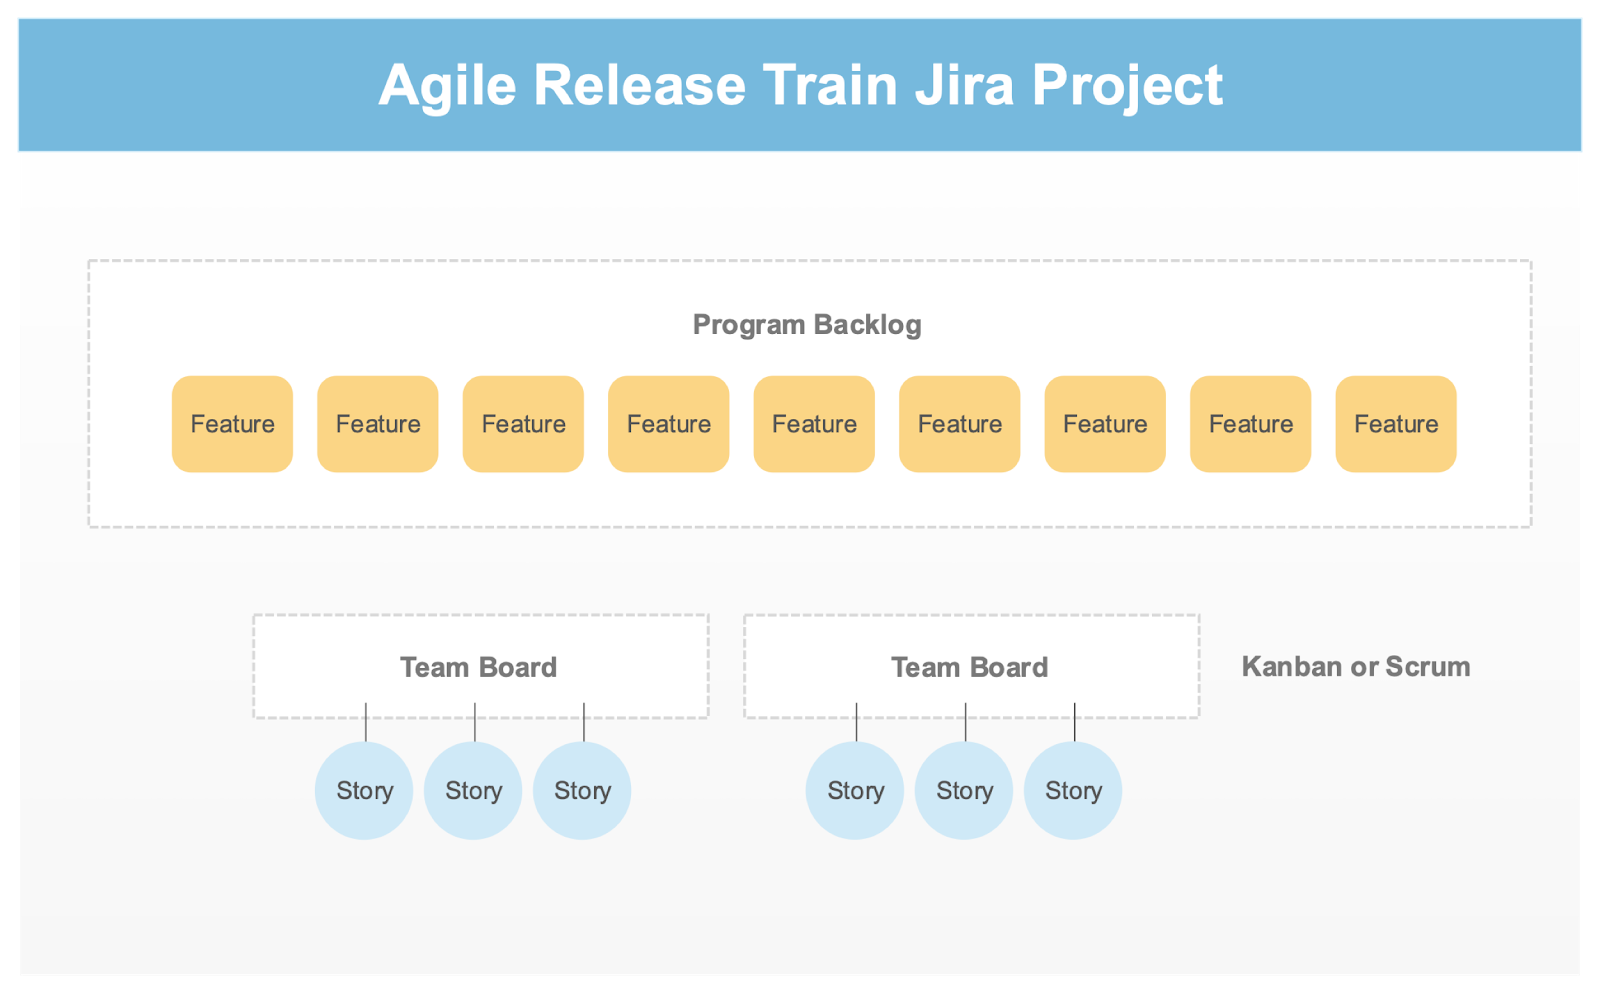 Agile Release Train